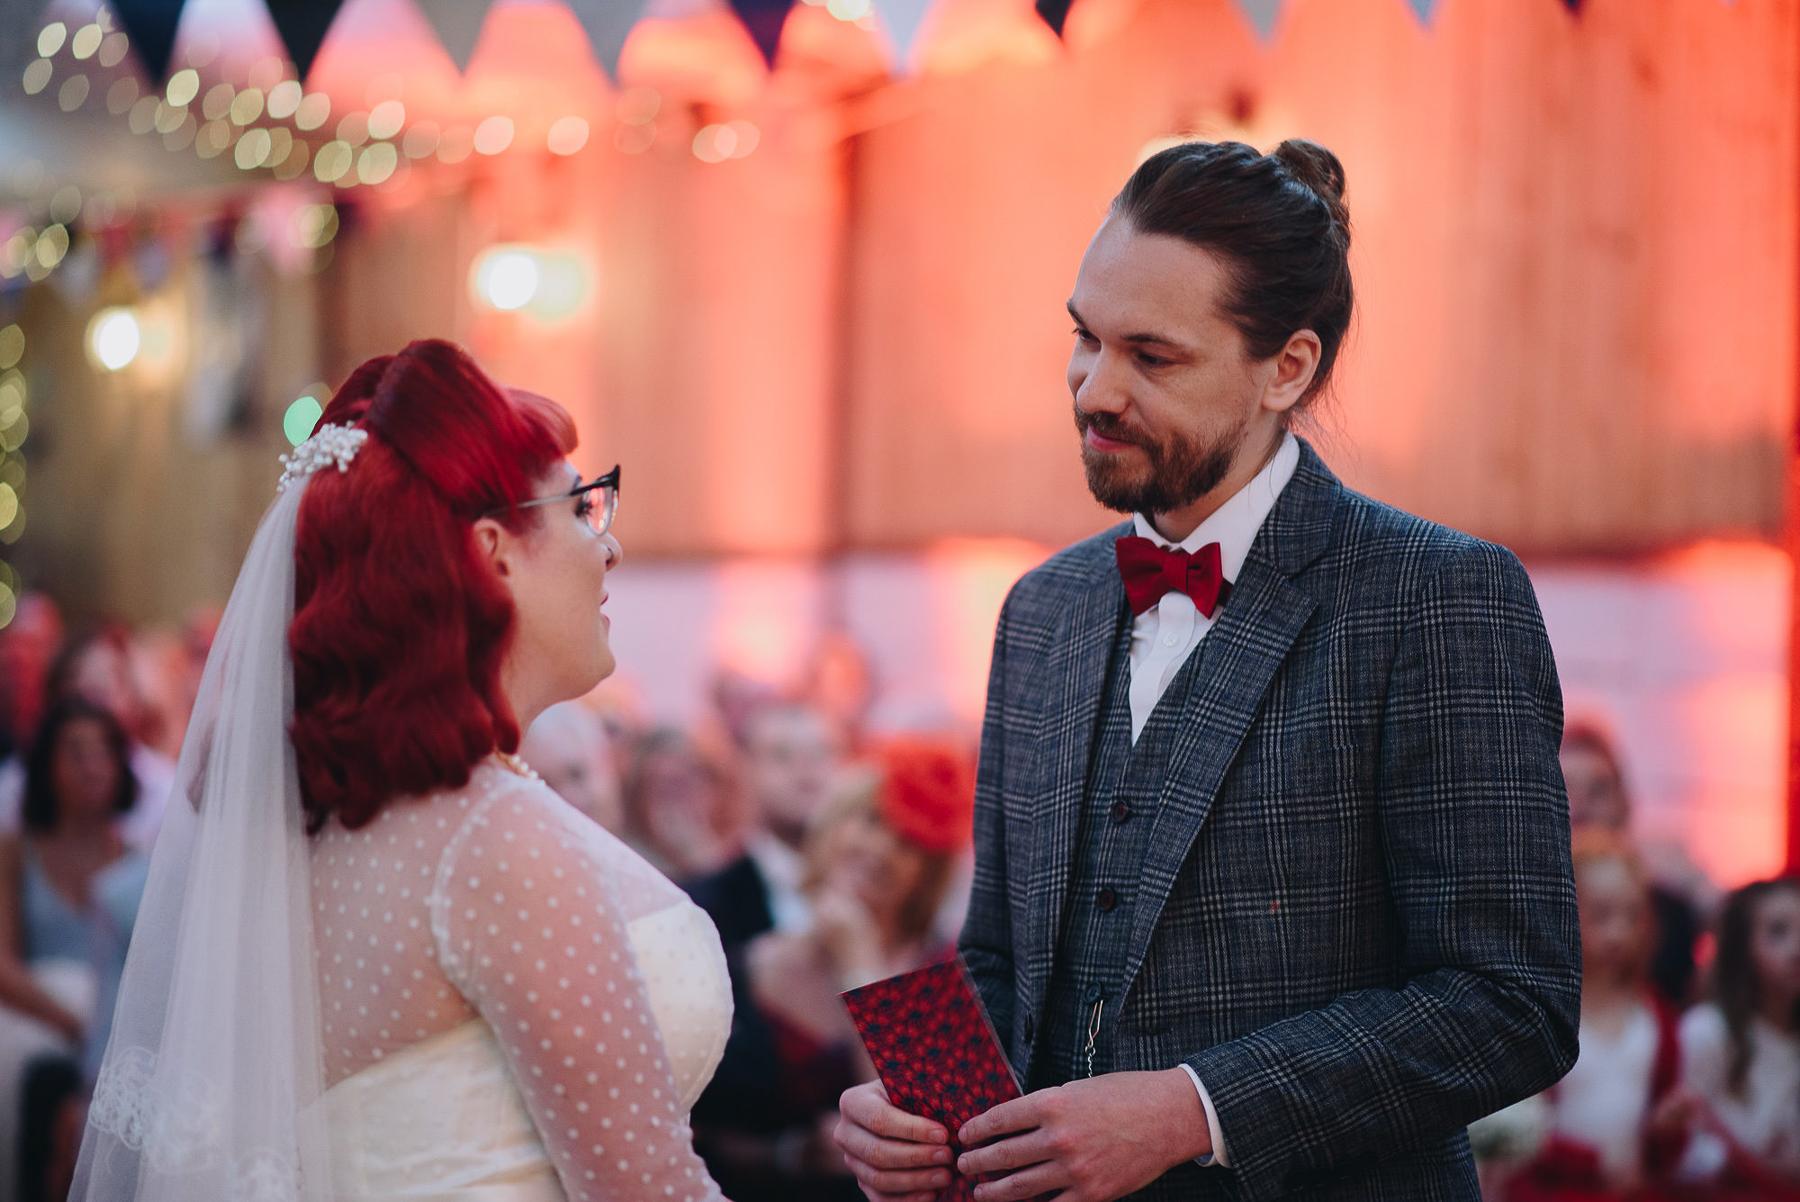 Wellbeing_Farm_Wedding_Photography_The_Pin-Up_Bride_Lara_Shaun-63.jpg